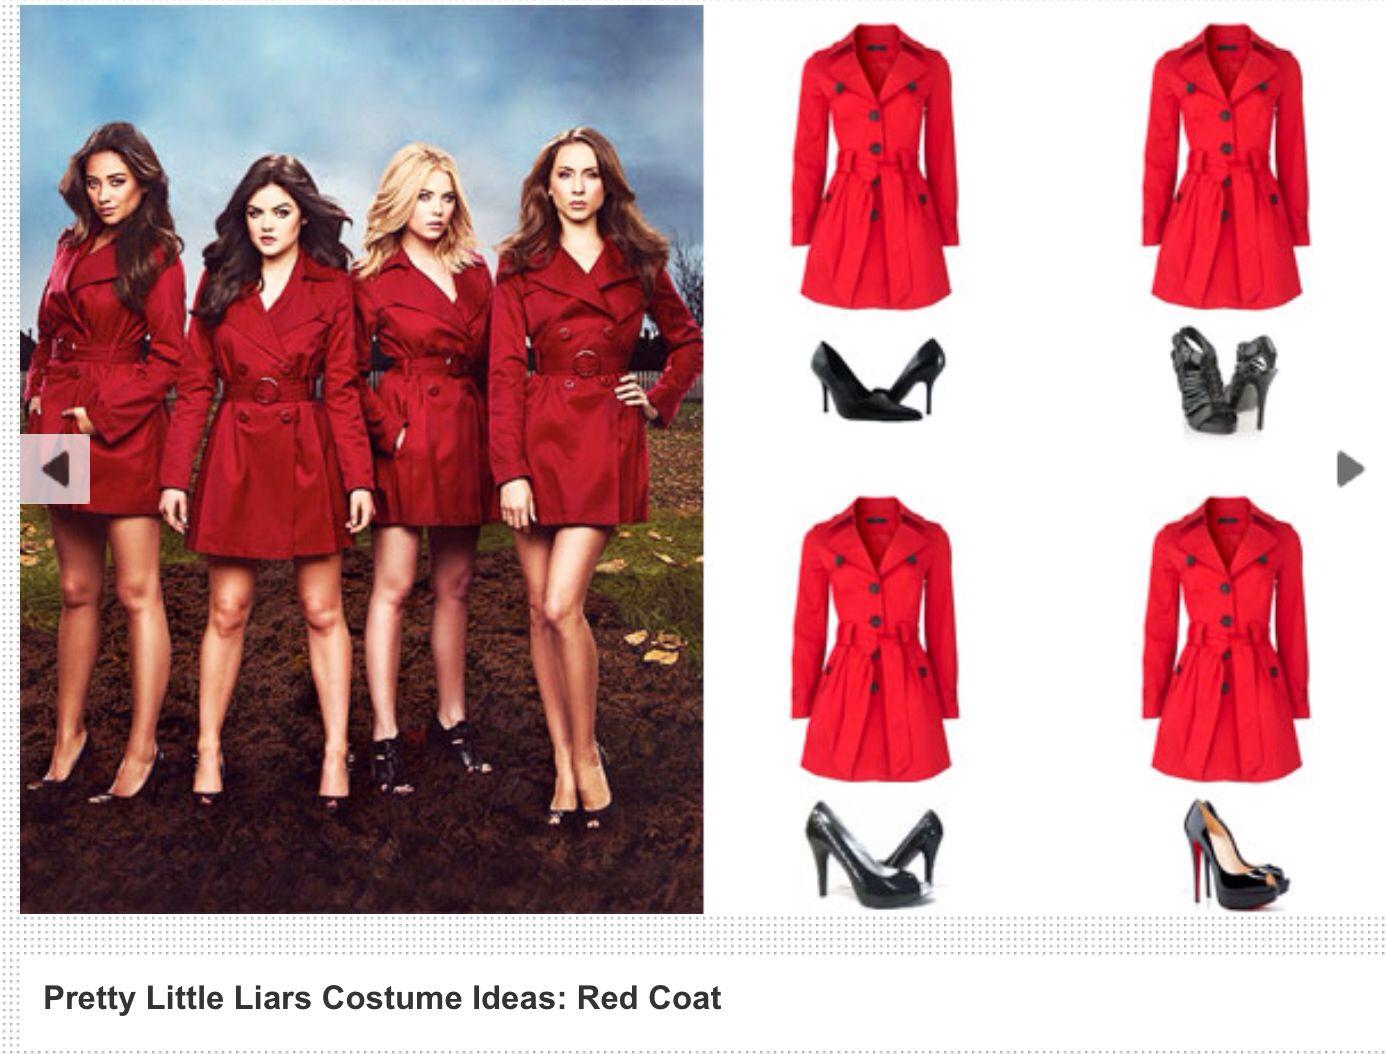 Red Coat Costume  Carnaval kostuums, Kostuum, Carnaval